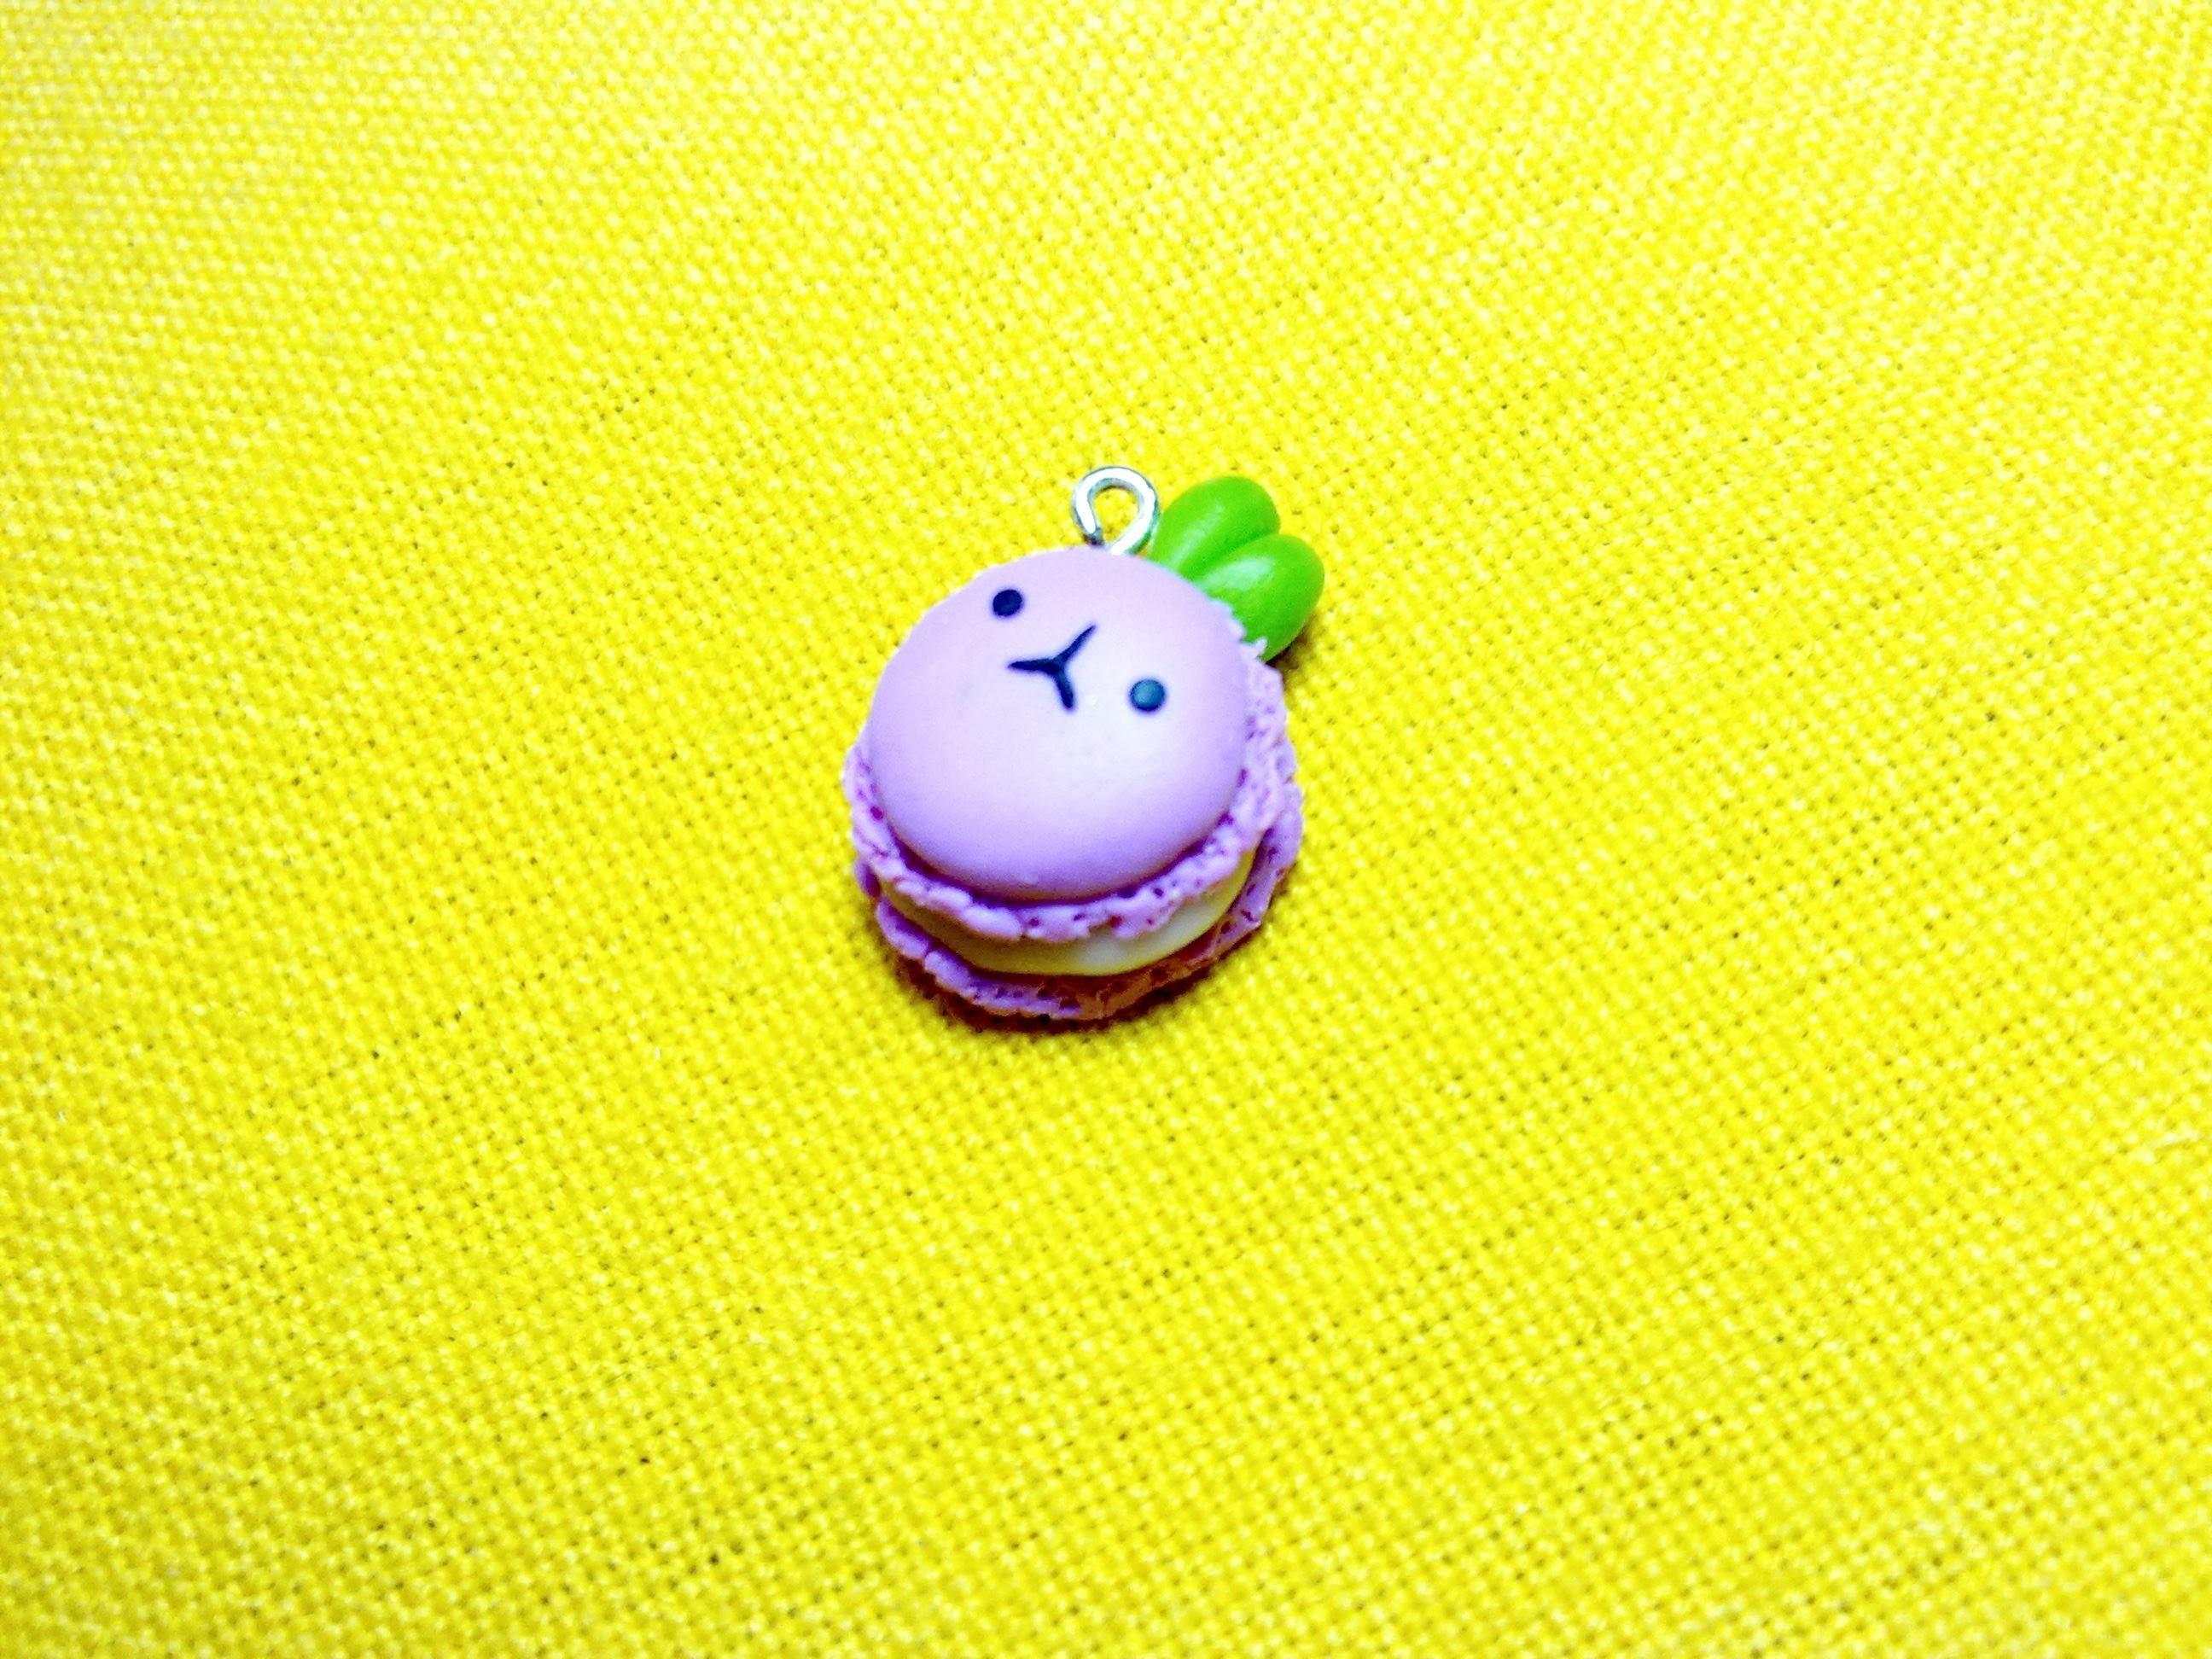 Kawaii Strawberry Bunny Macaron ♡ Coniglietto Macaron Kawaii alla Fragola (Polymer Clay Tutorial)